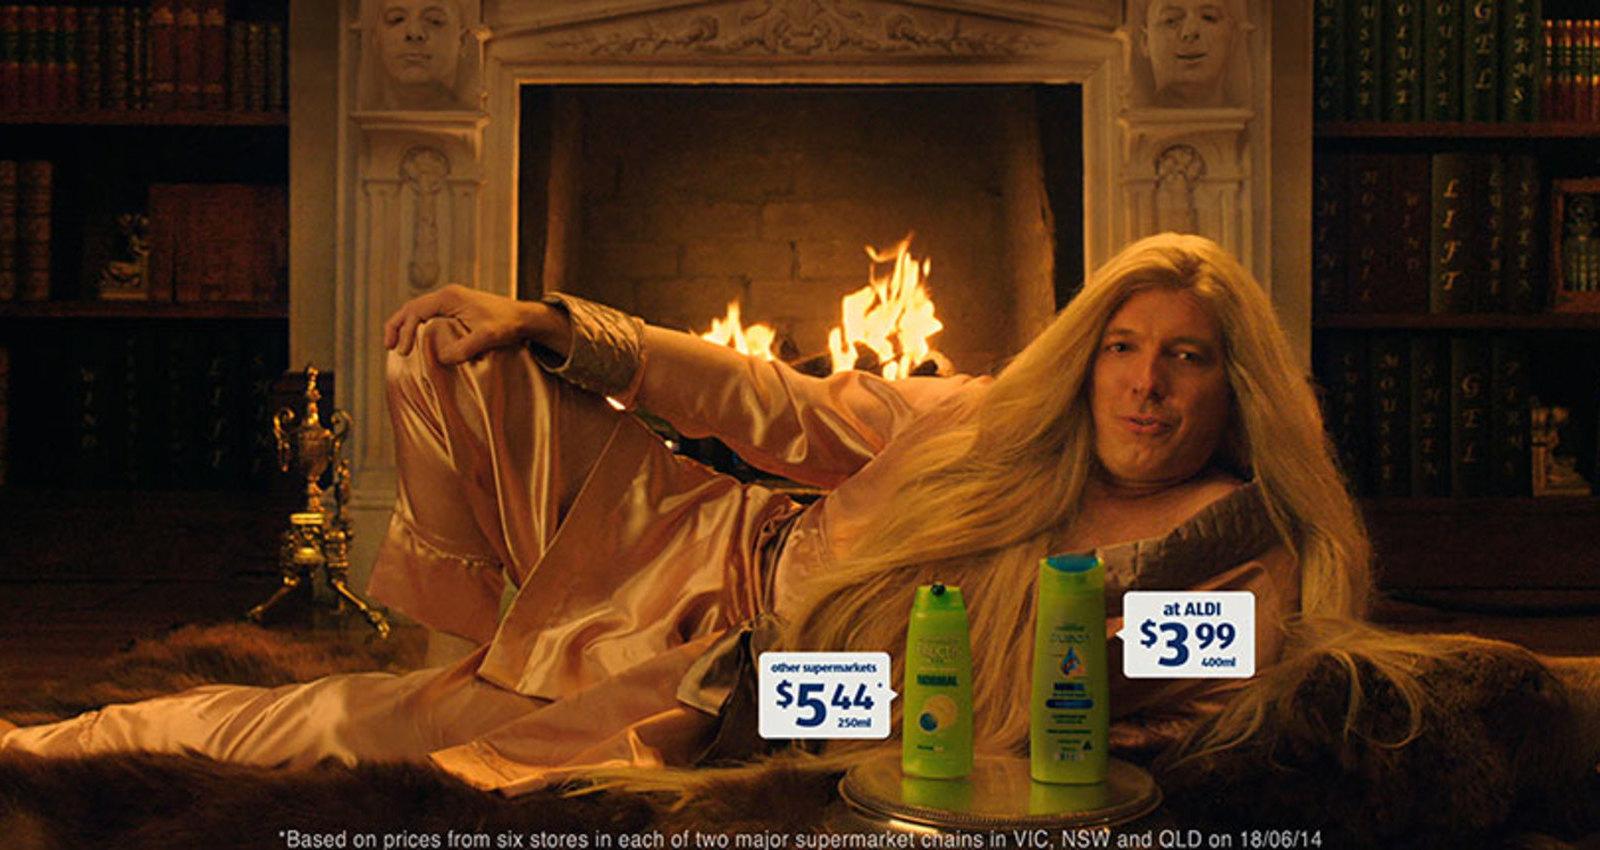 Like Brands. Only Cheaper